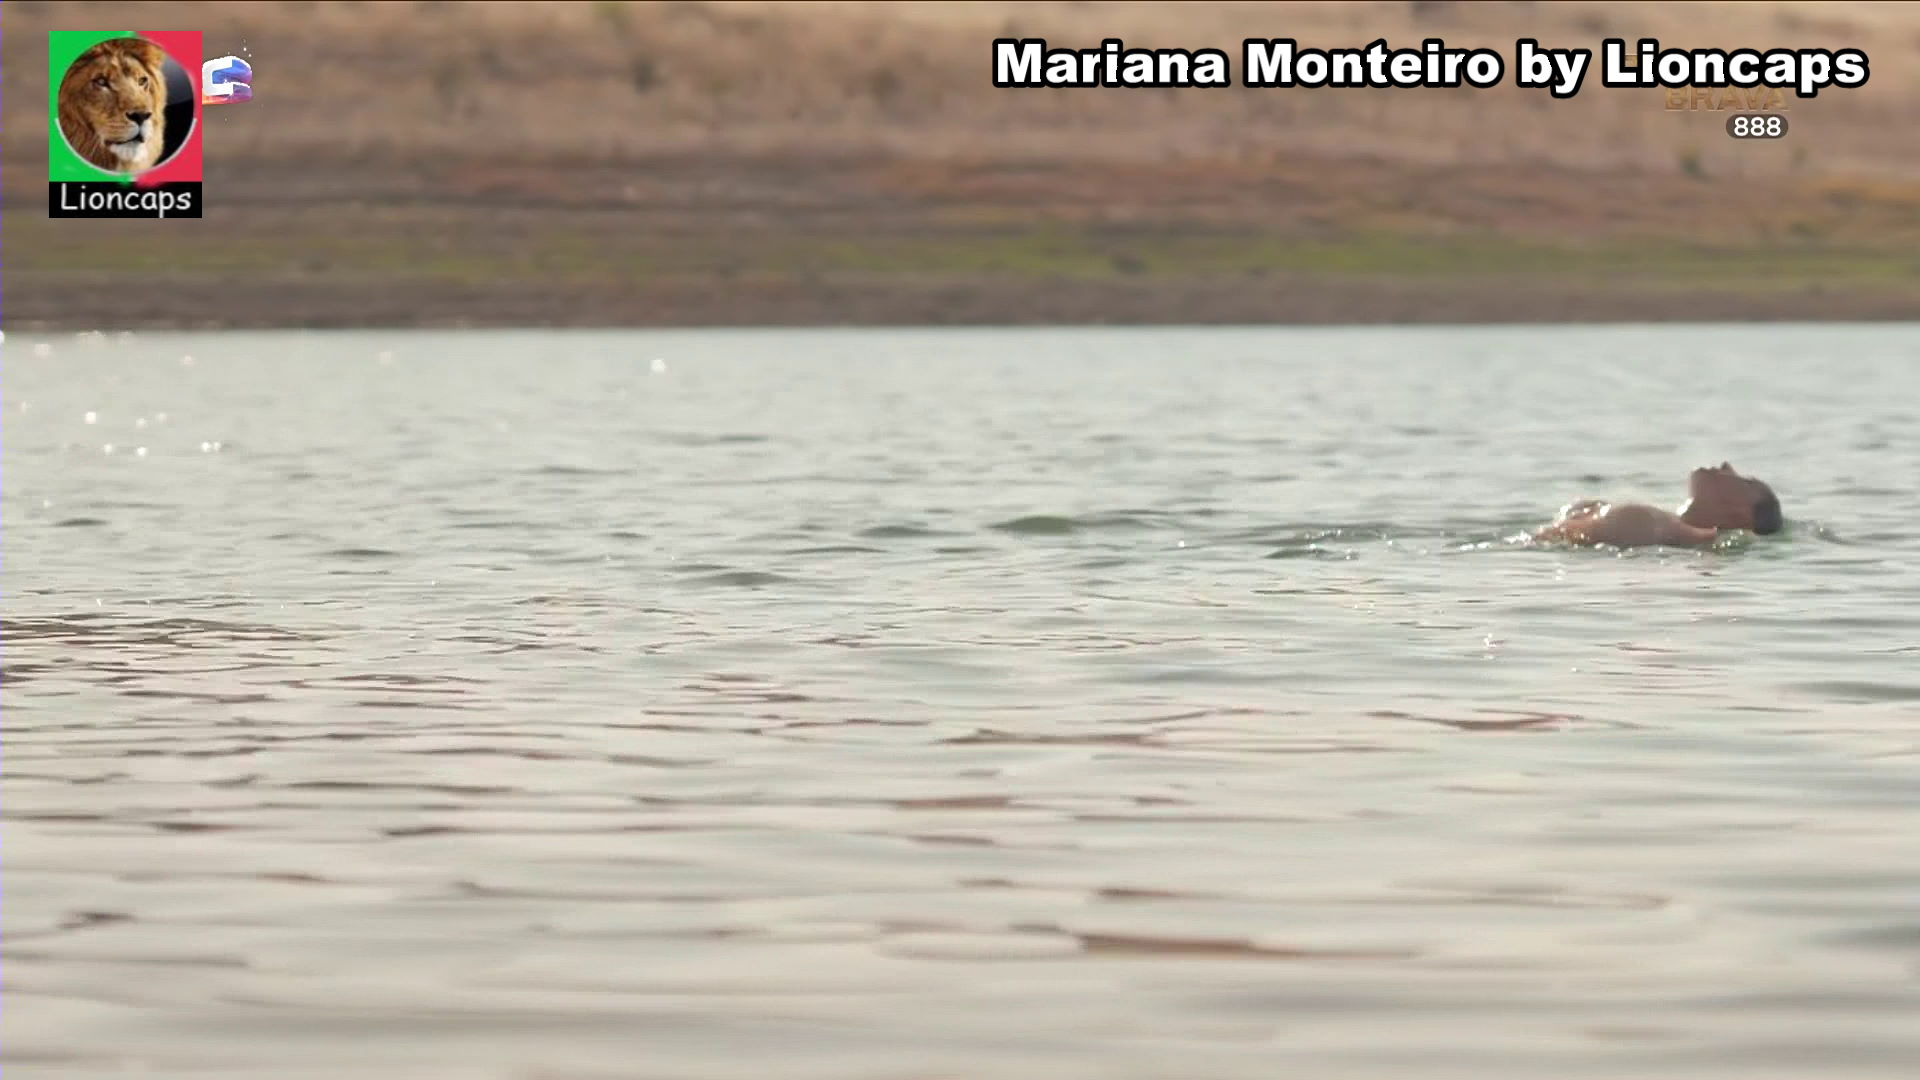 196461559_mariana_monteiro_vs191201_0327_122_526lo.JPG